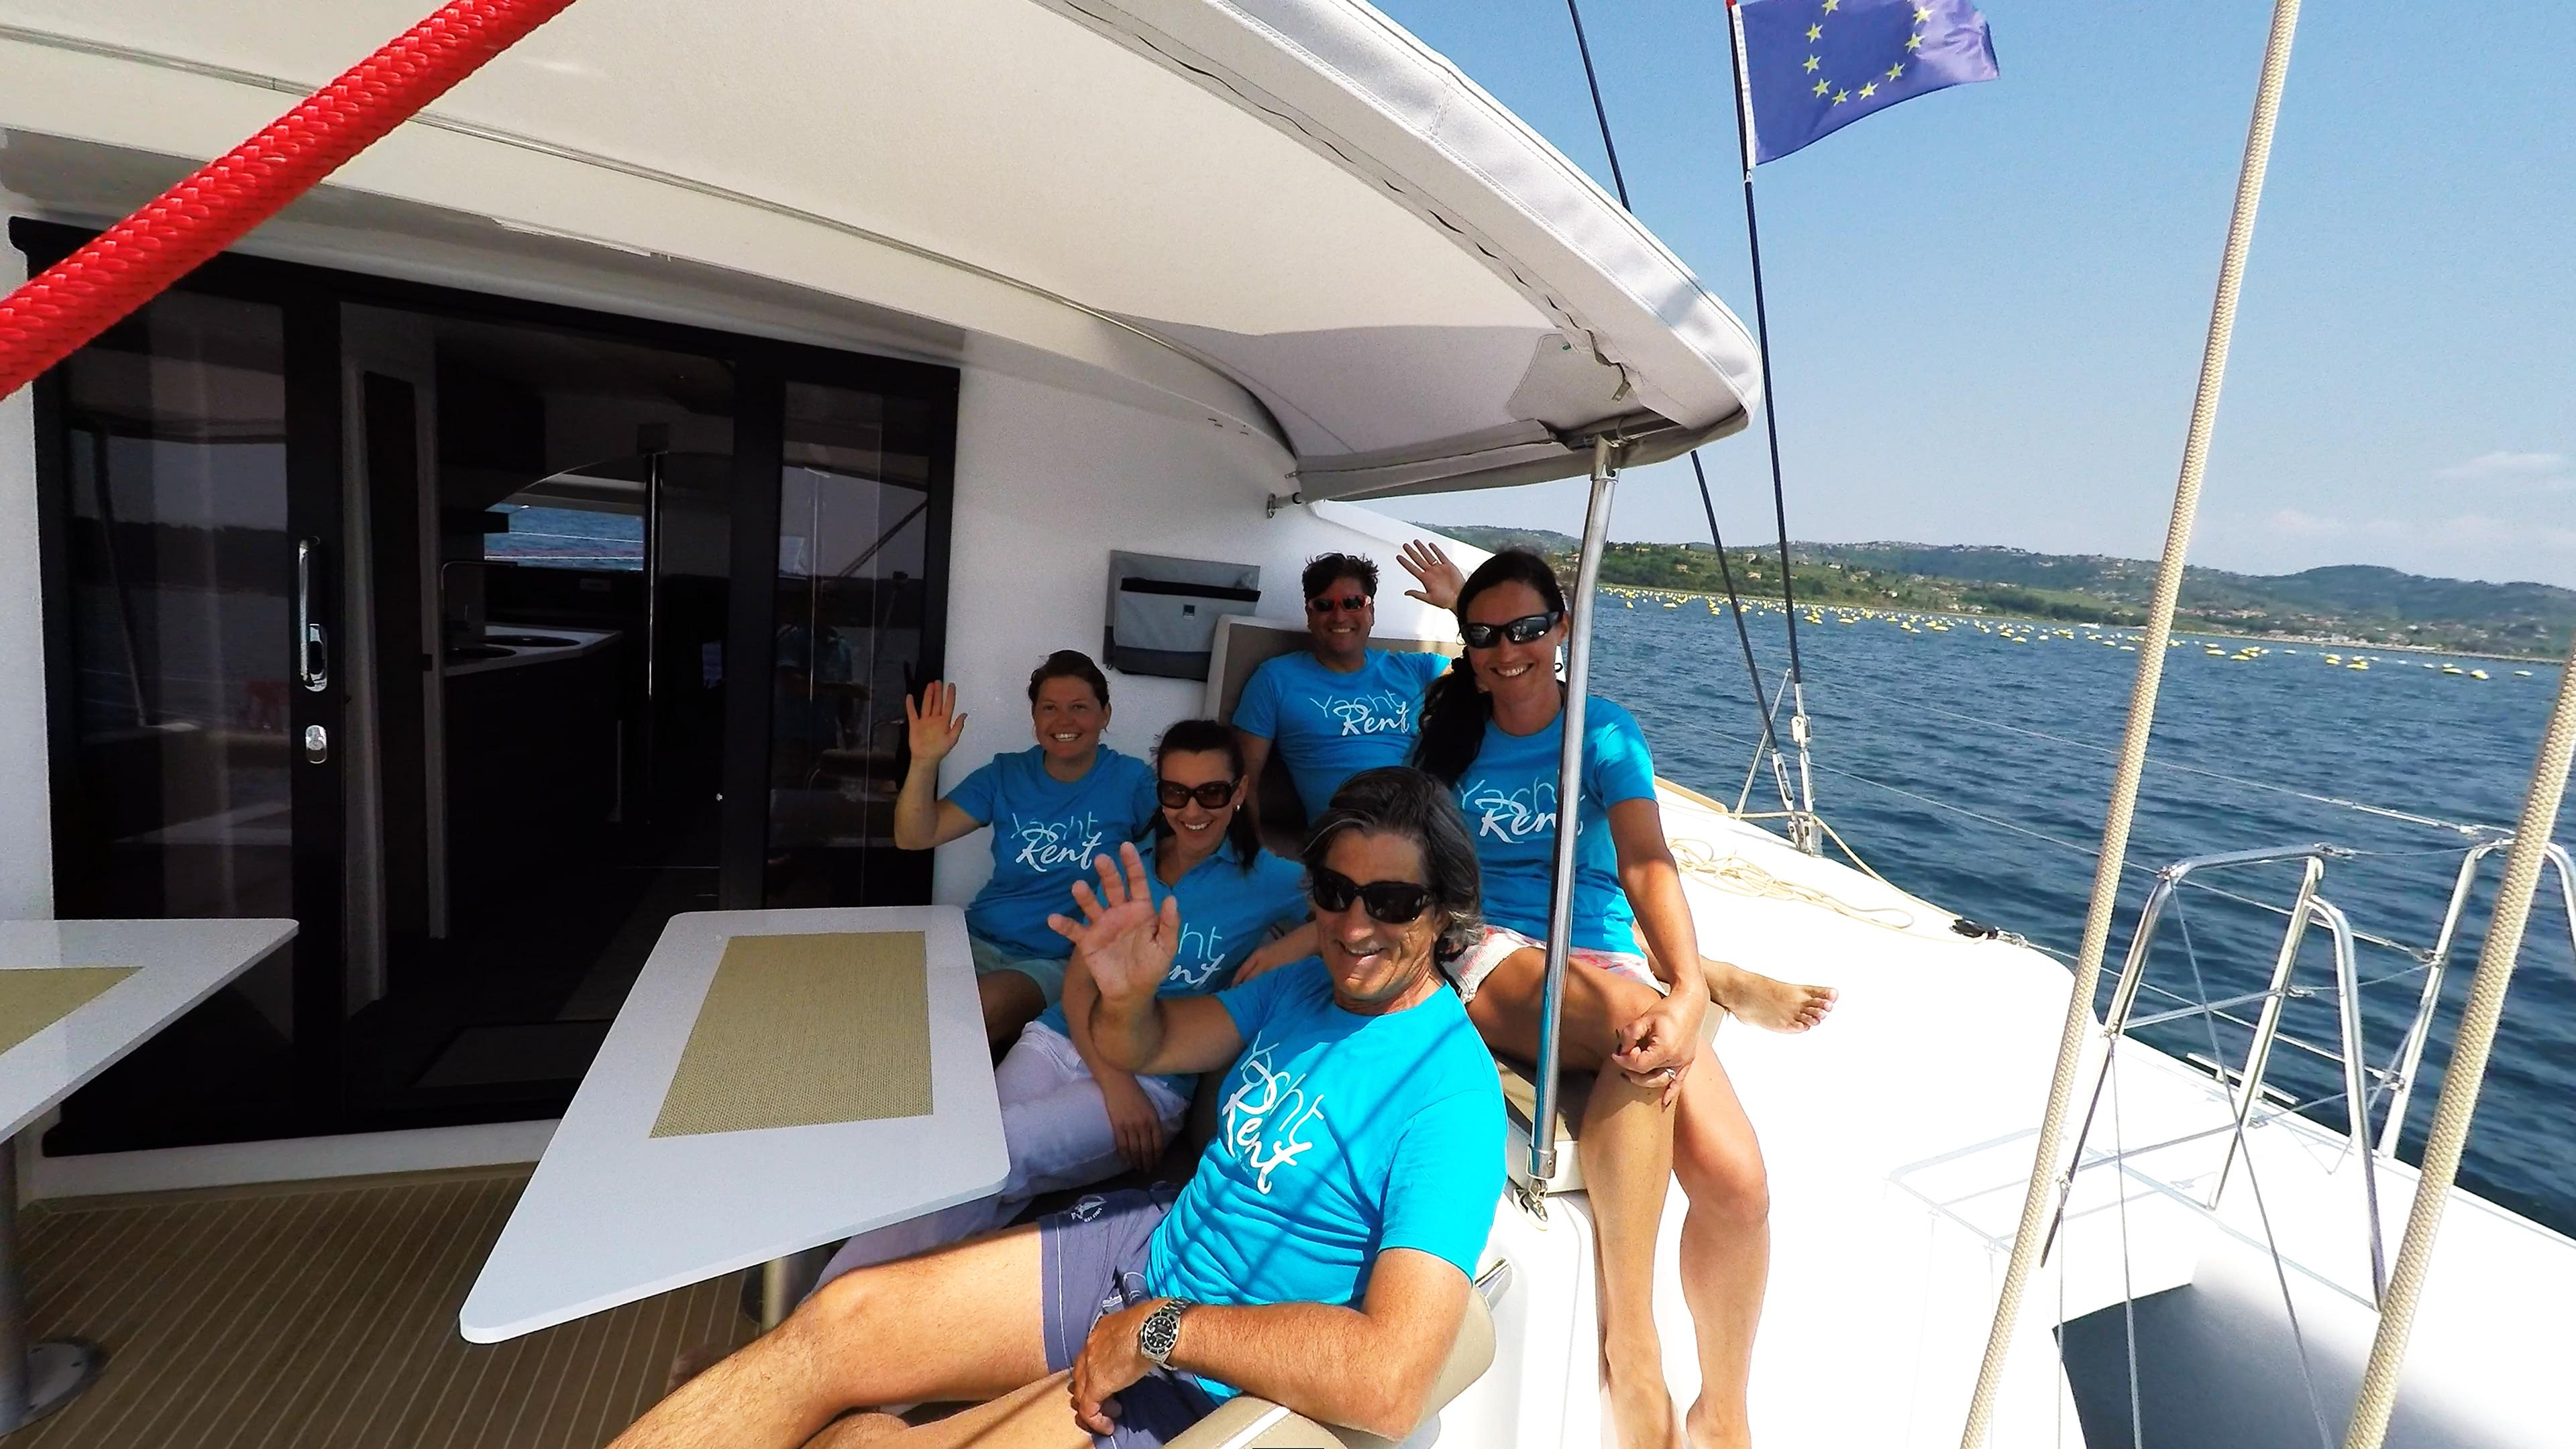 equipaggio waving cockpit trimarano yacht